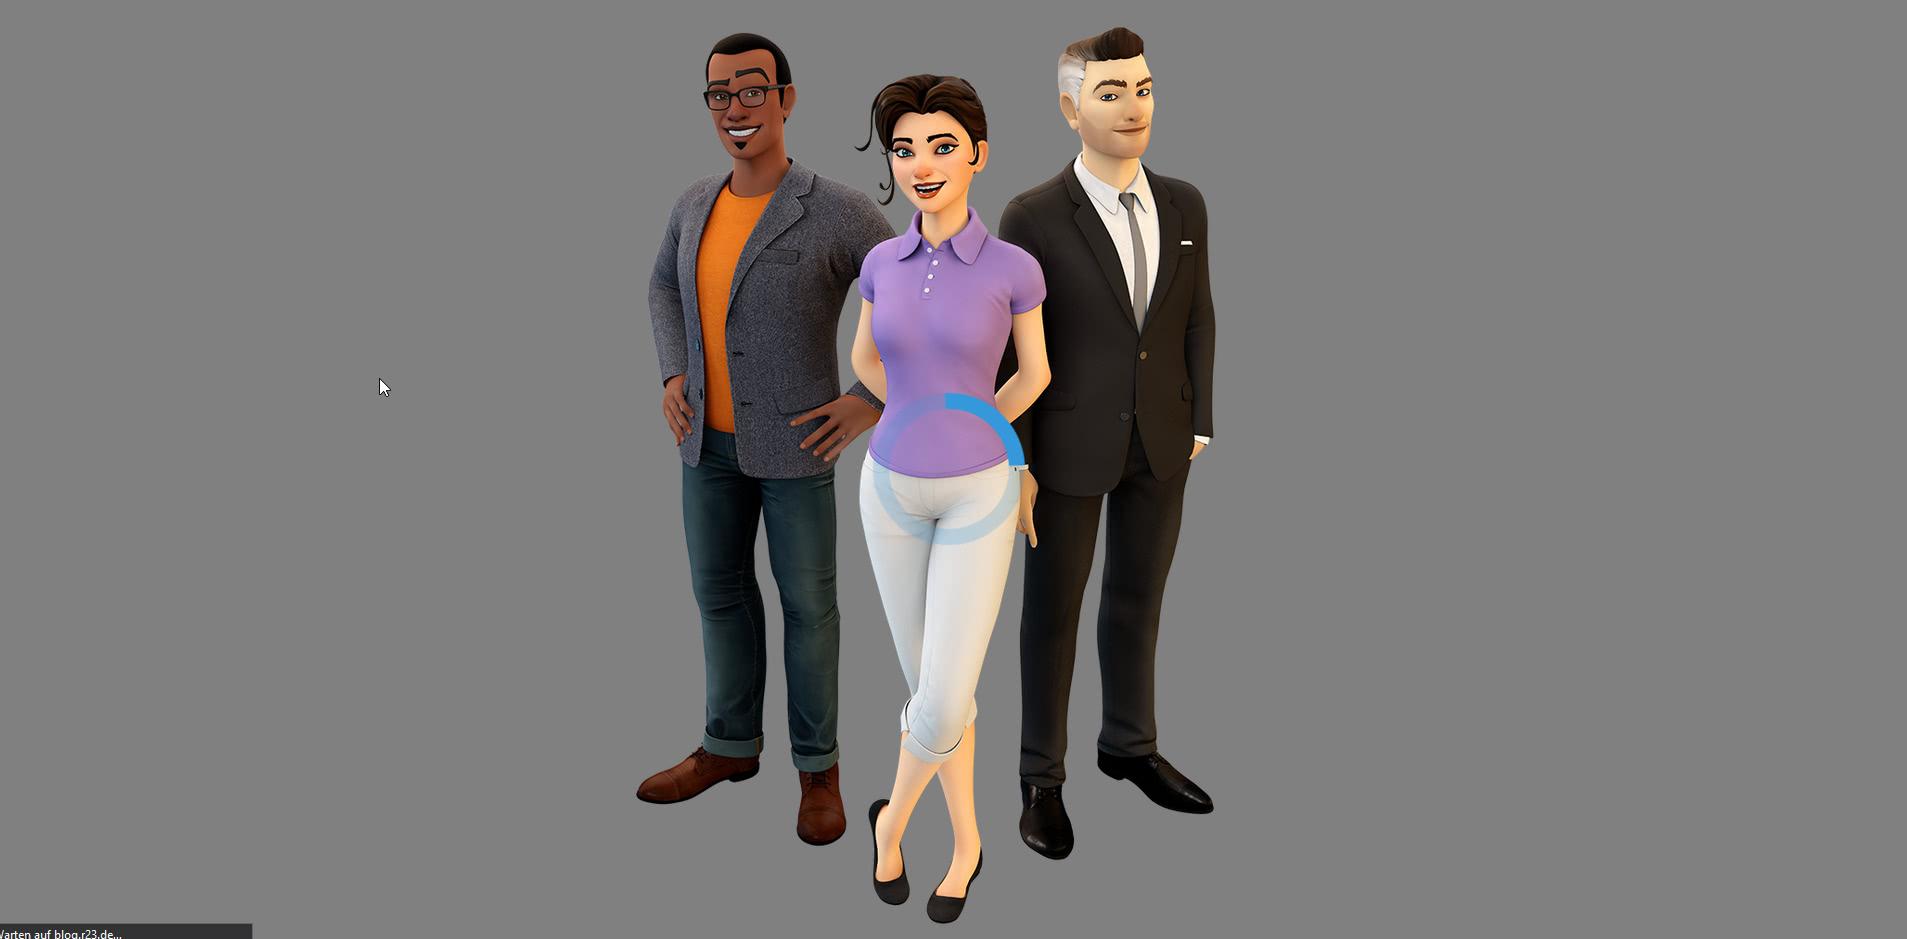 Interaktive animierte 3D-Charaktere im Web 1